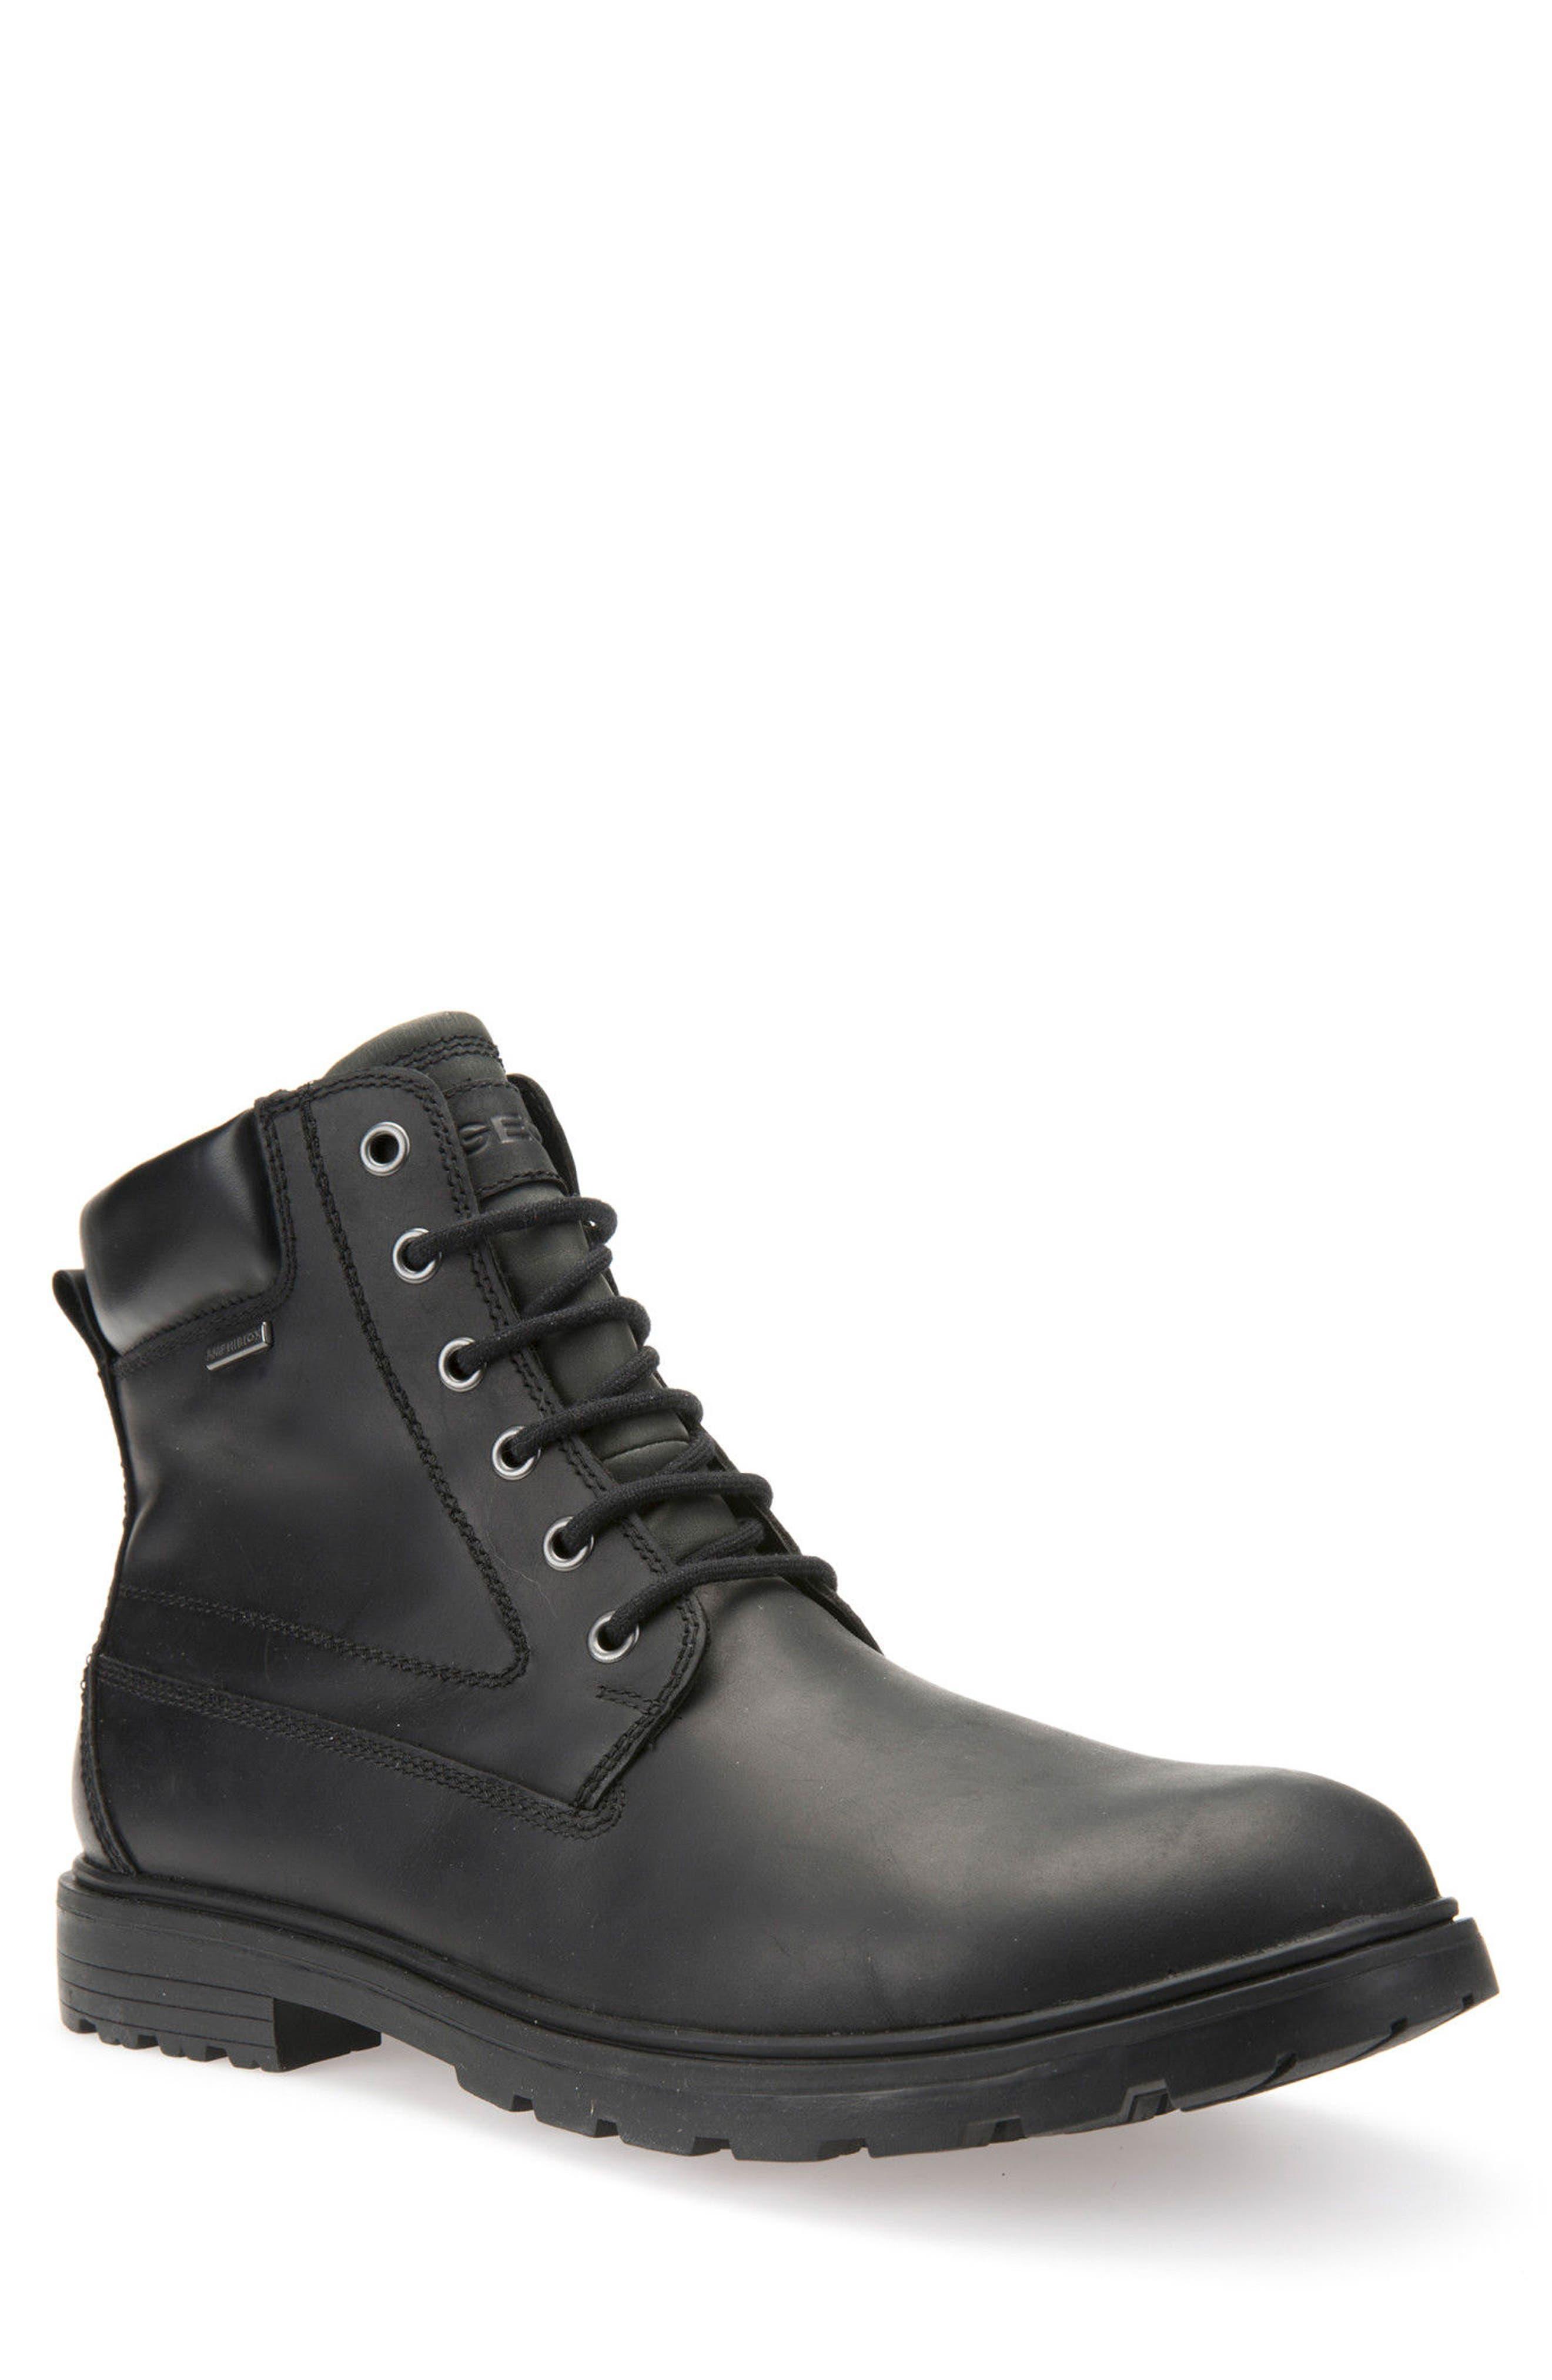 Makim Waterproof Plain Toe Boot,                             Main thumbnail 1, color,                             Black